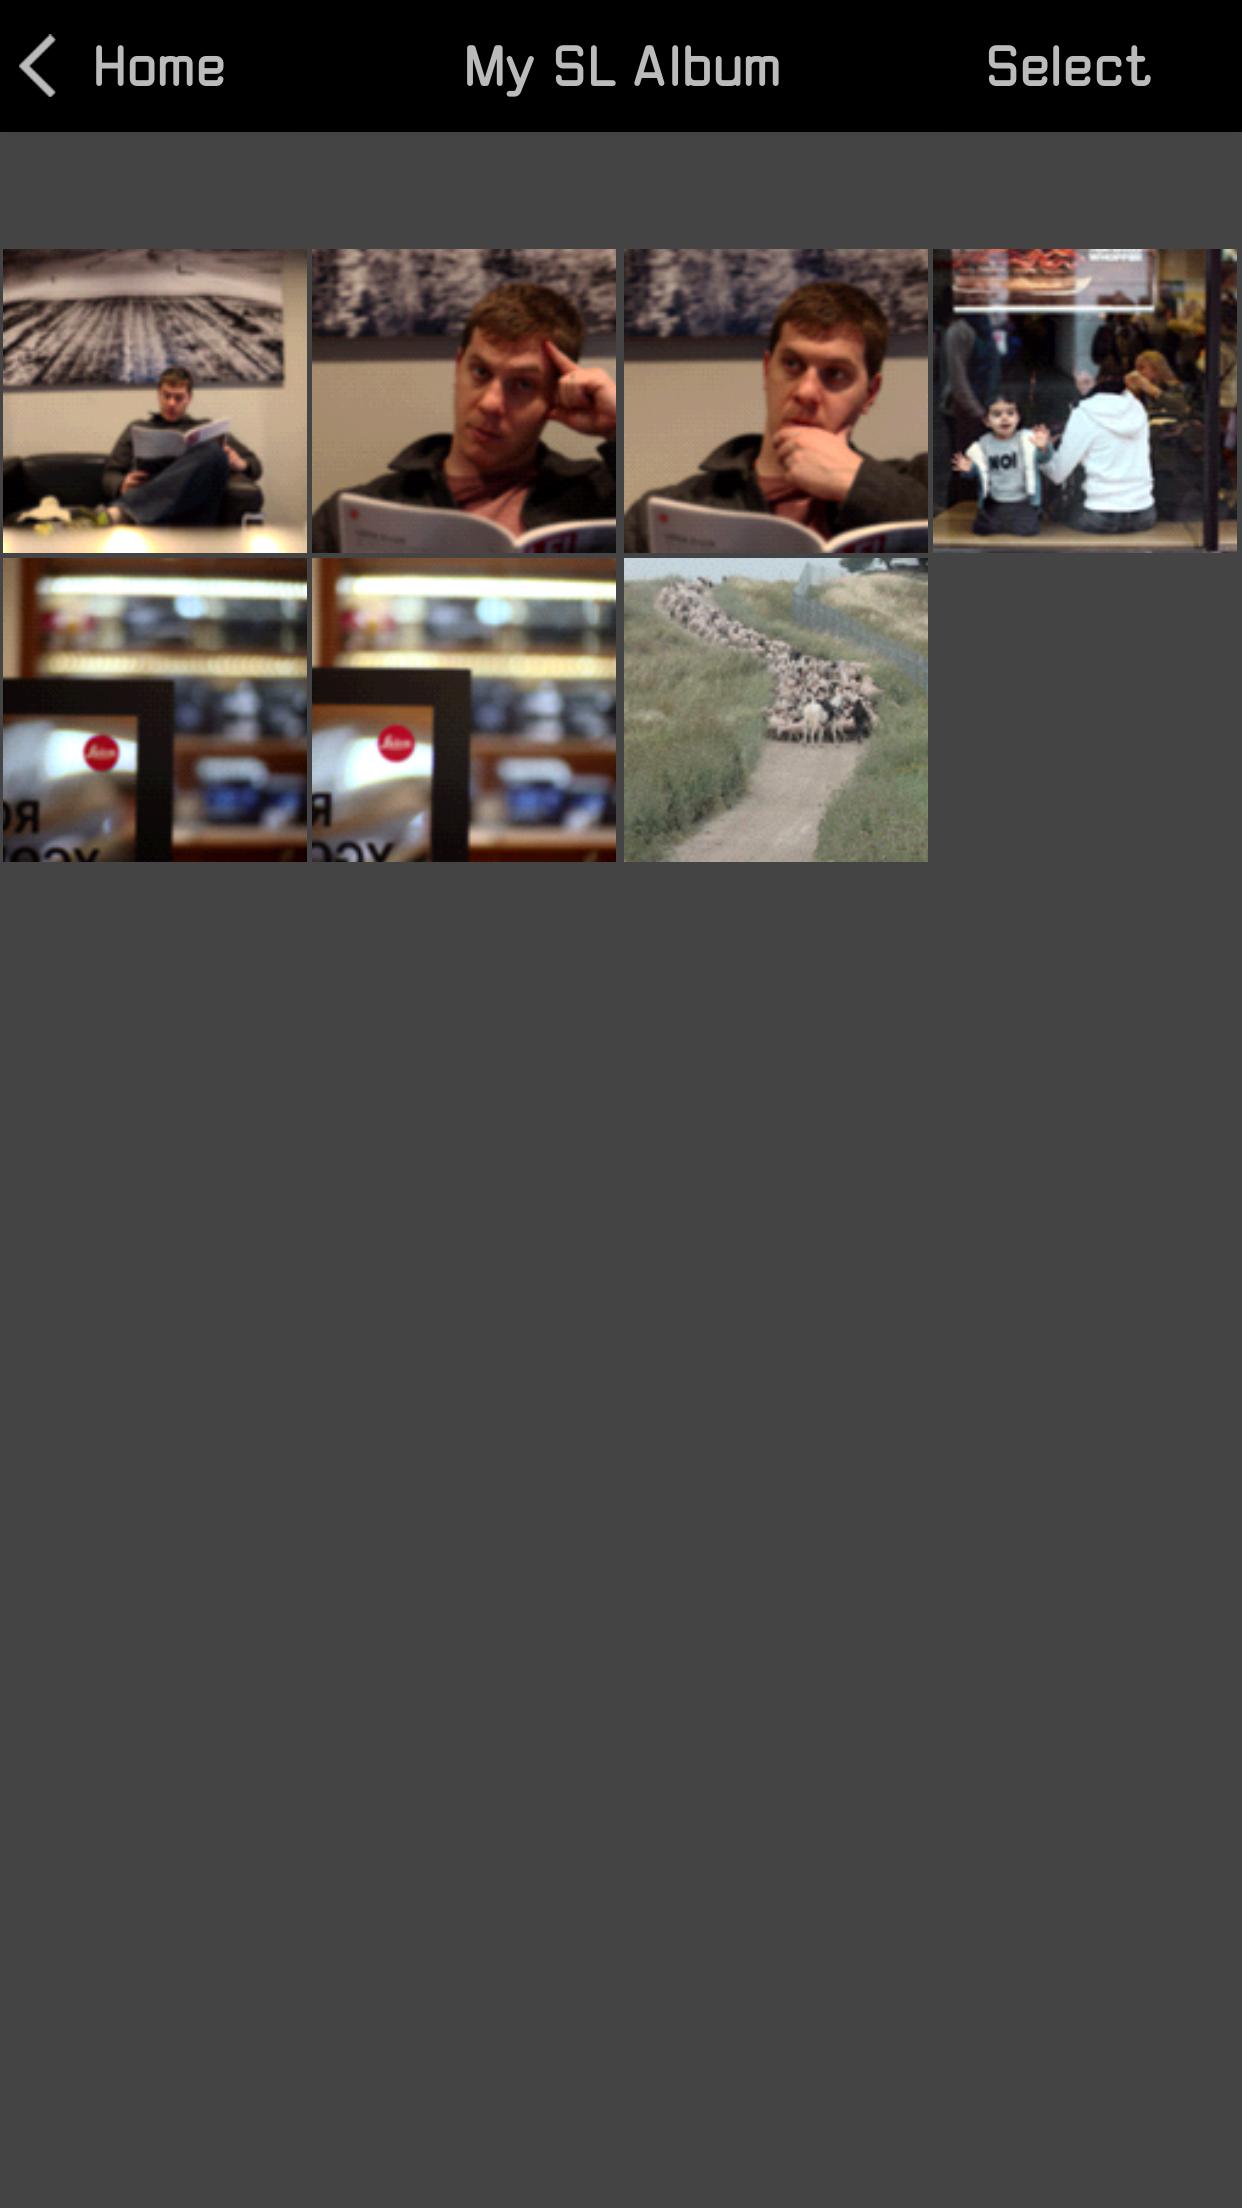 Photos saved in the Leica Photos album..... seems duplicative to me, but no biggie.